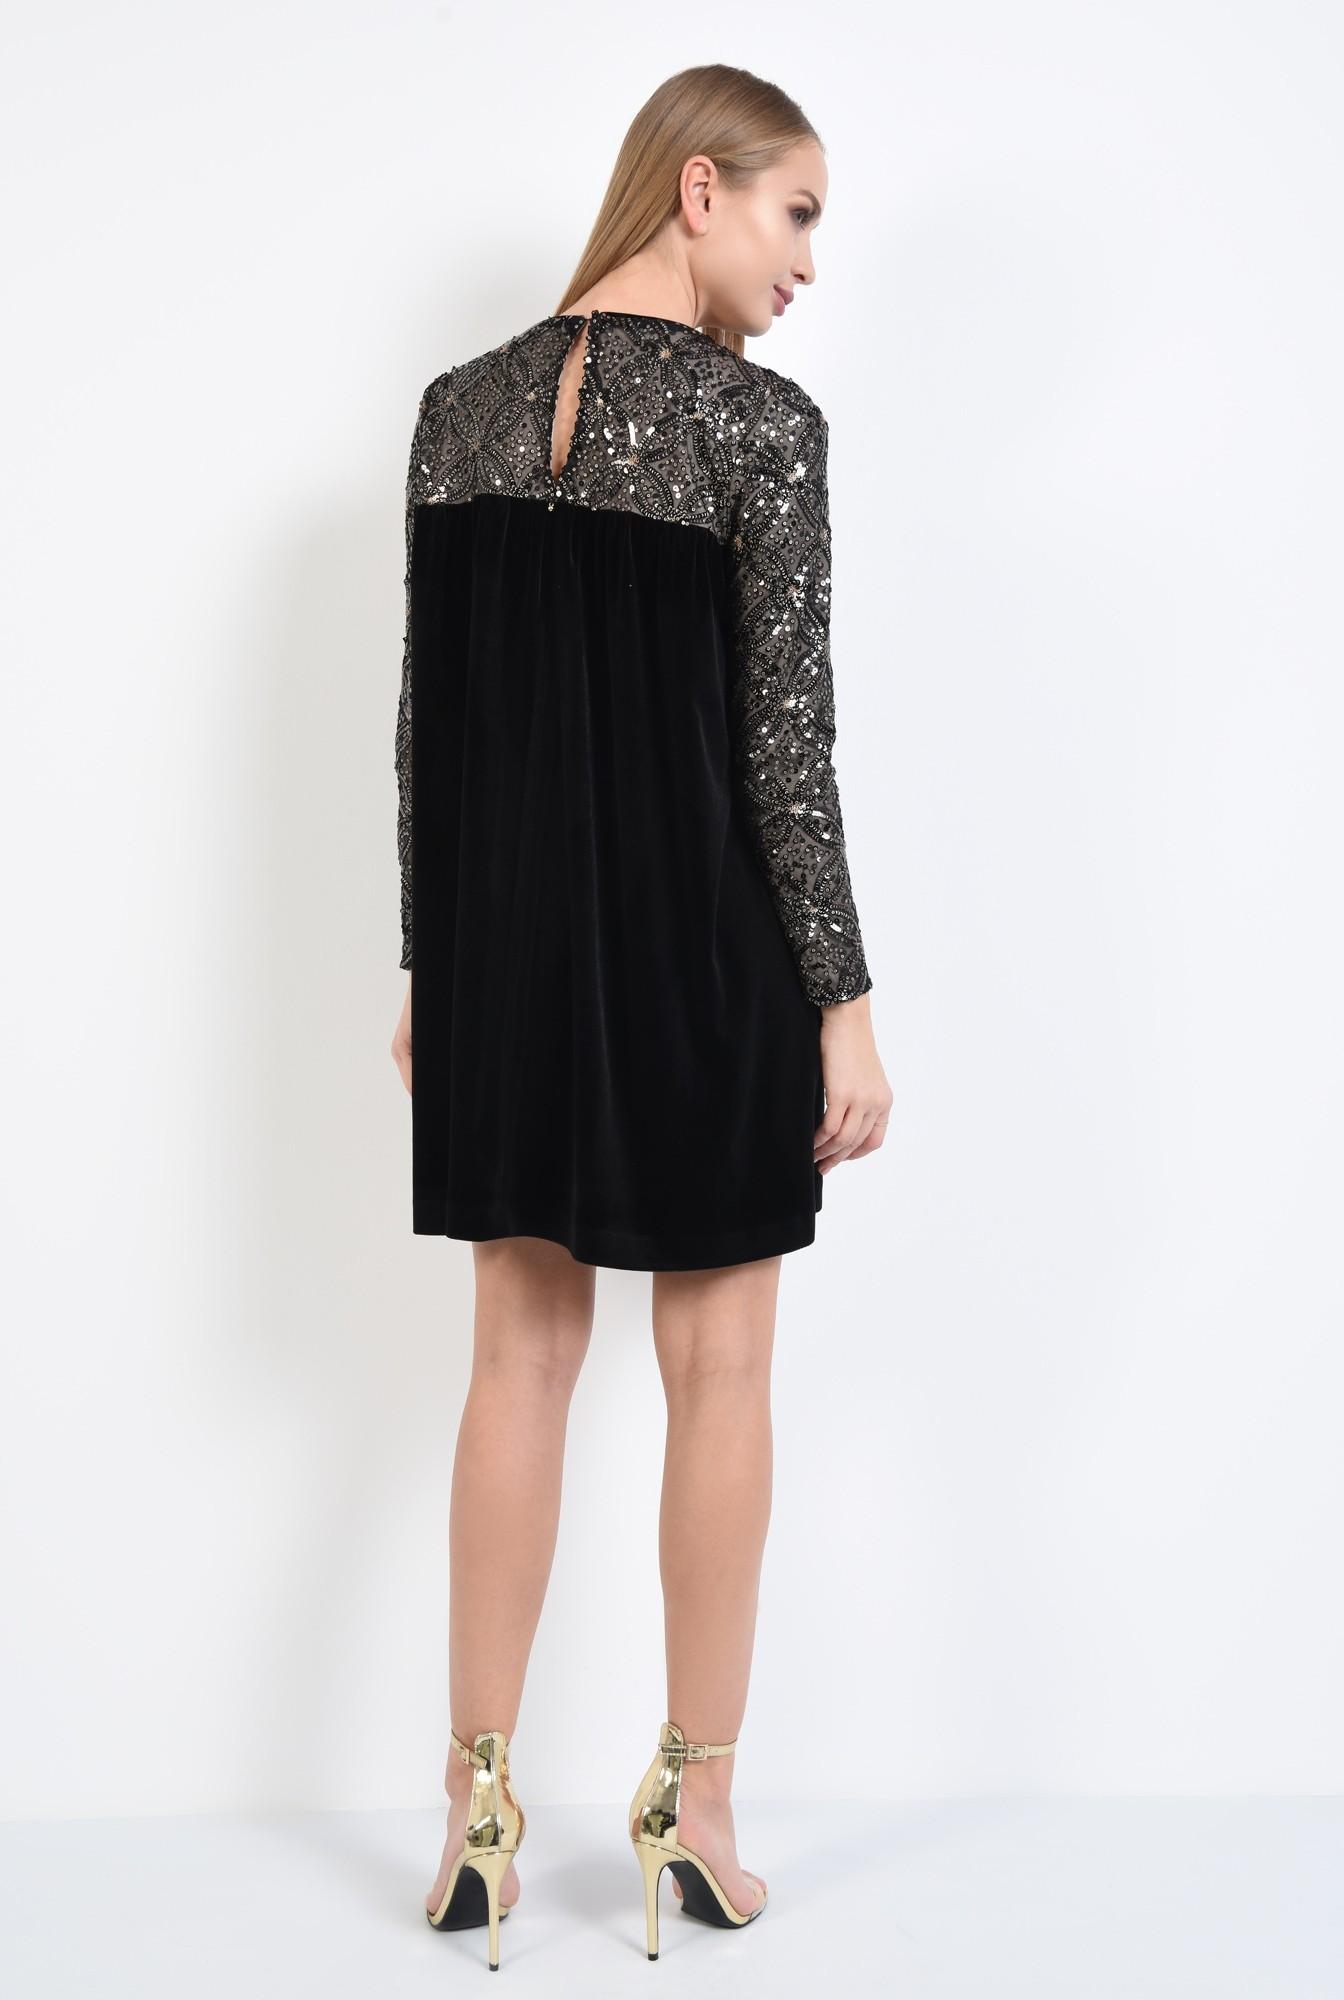 1 - 360 - rochie de ocazie, din catifea, paiete aurii, scurta, babydoll